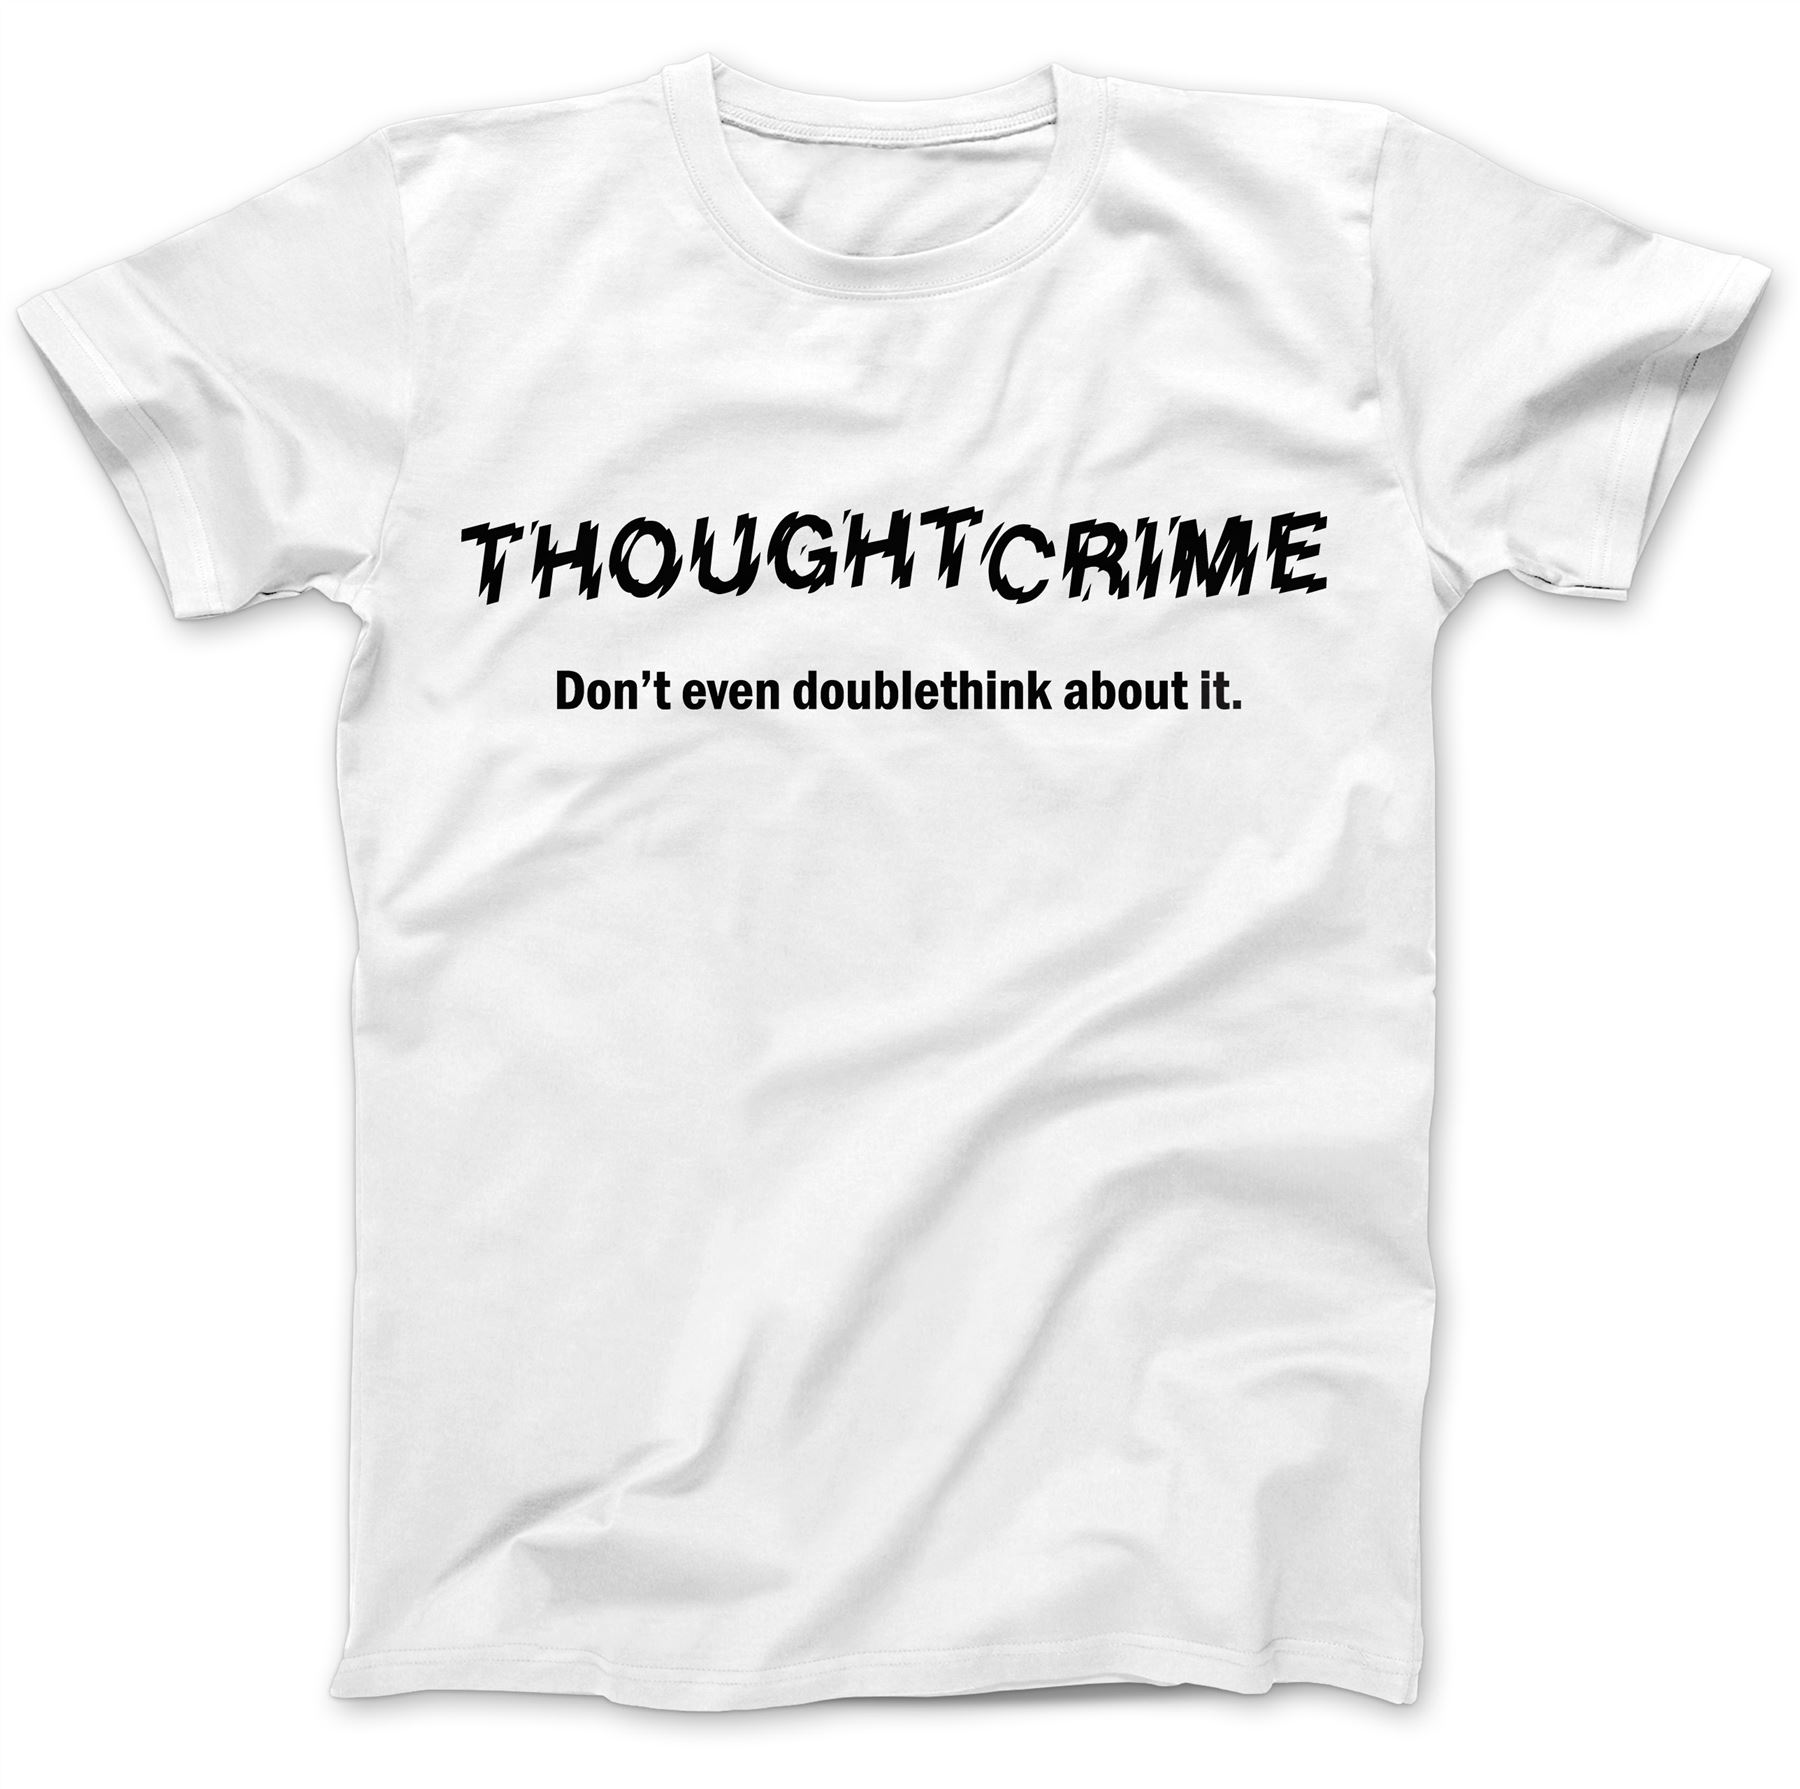 1984-Thought-Crime-George-Orwell-T-Shirt-100-Premium-Cotton-Animal-Farm miniatuur 22